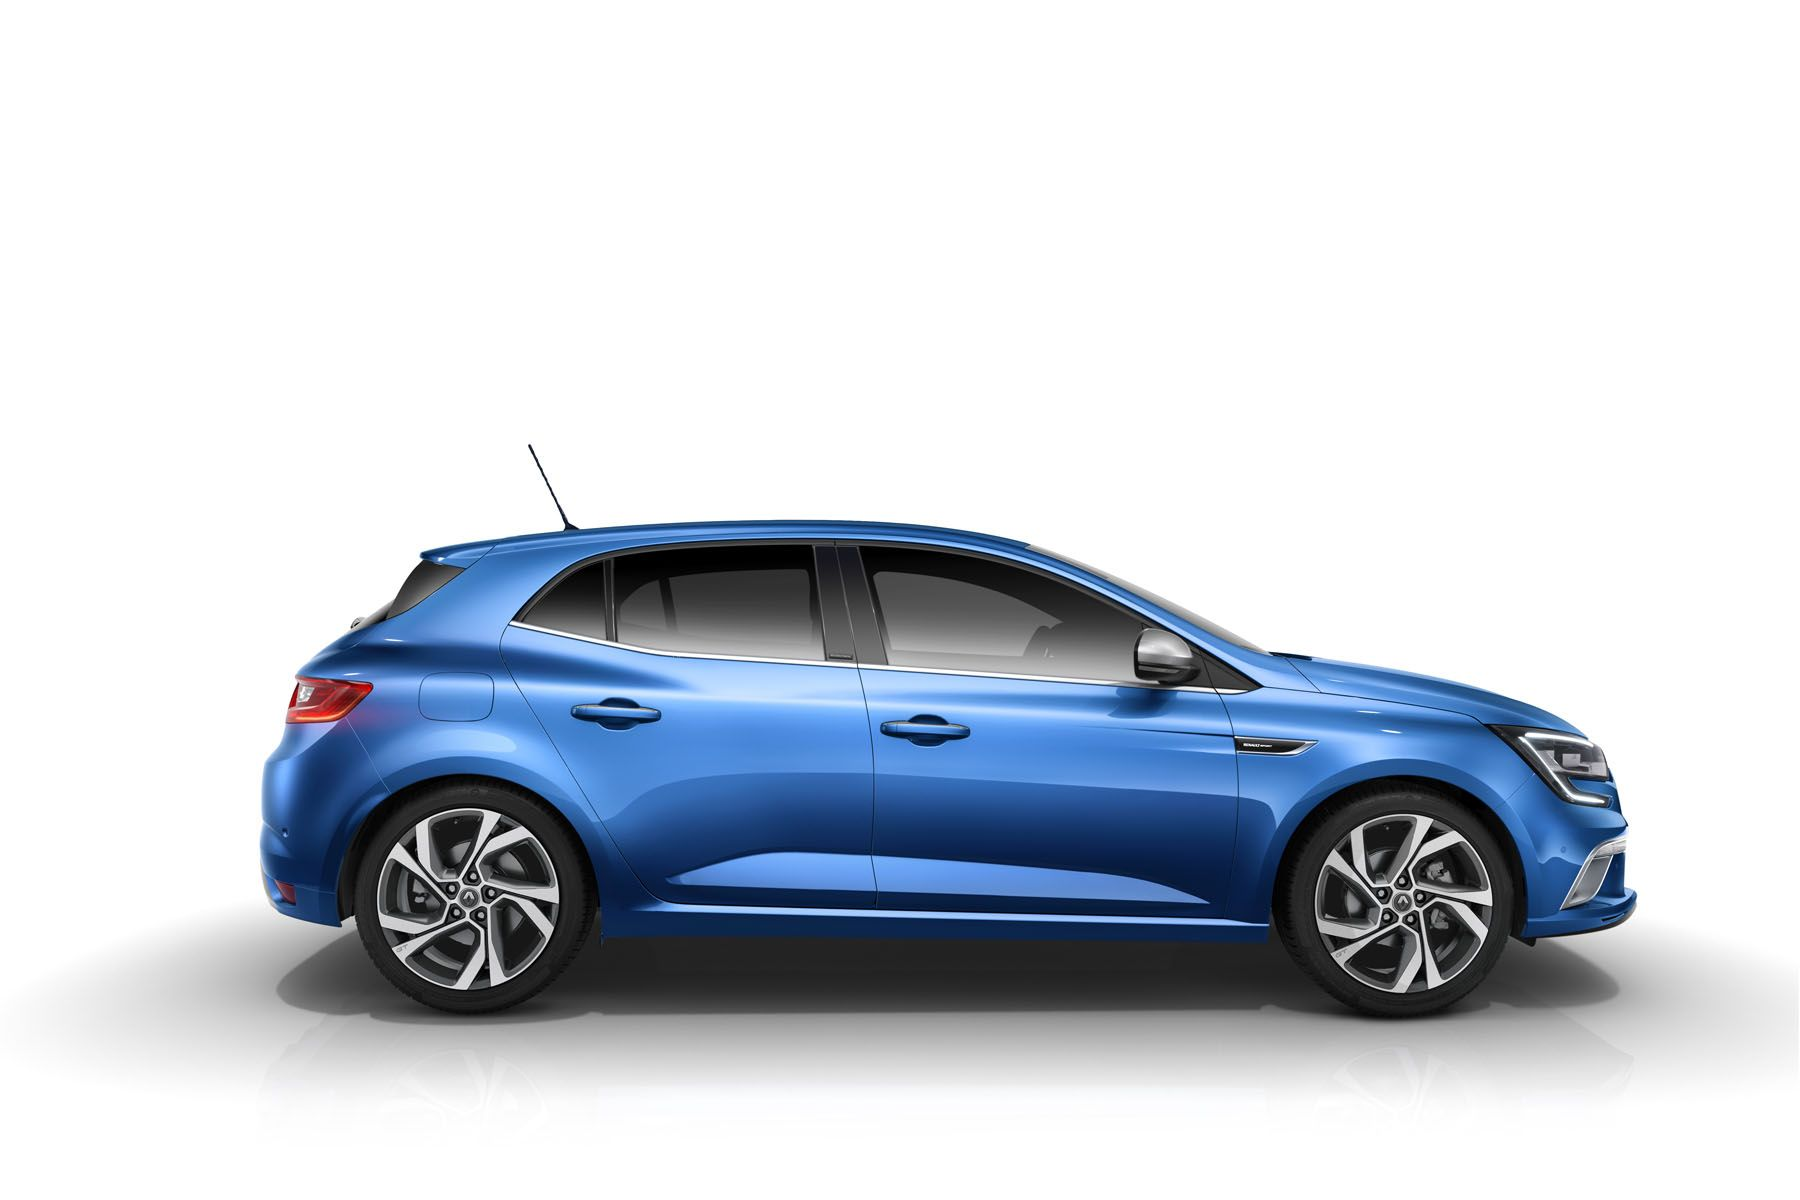 New Renault Megane Gt C Renault Marketing 3d Commerce New